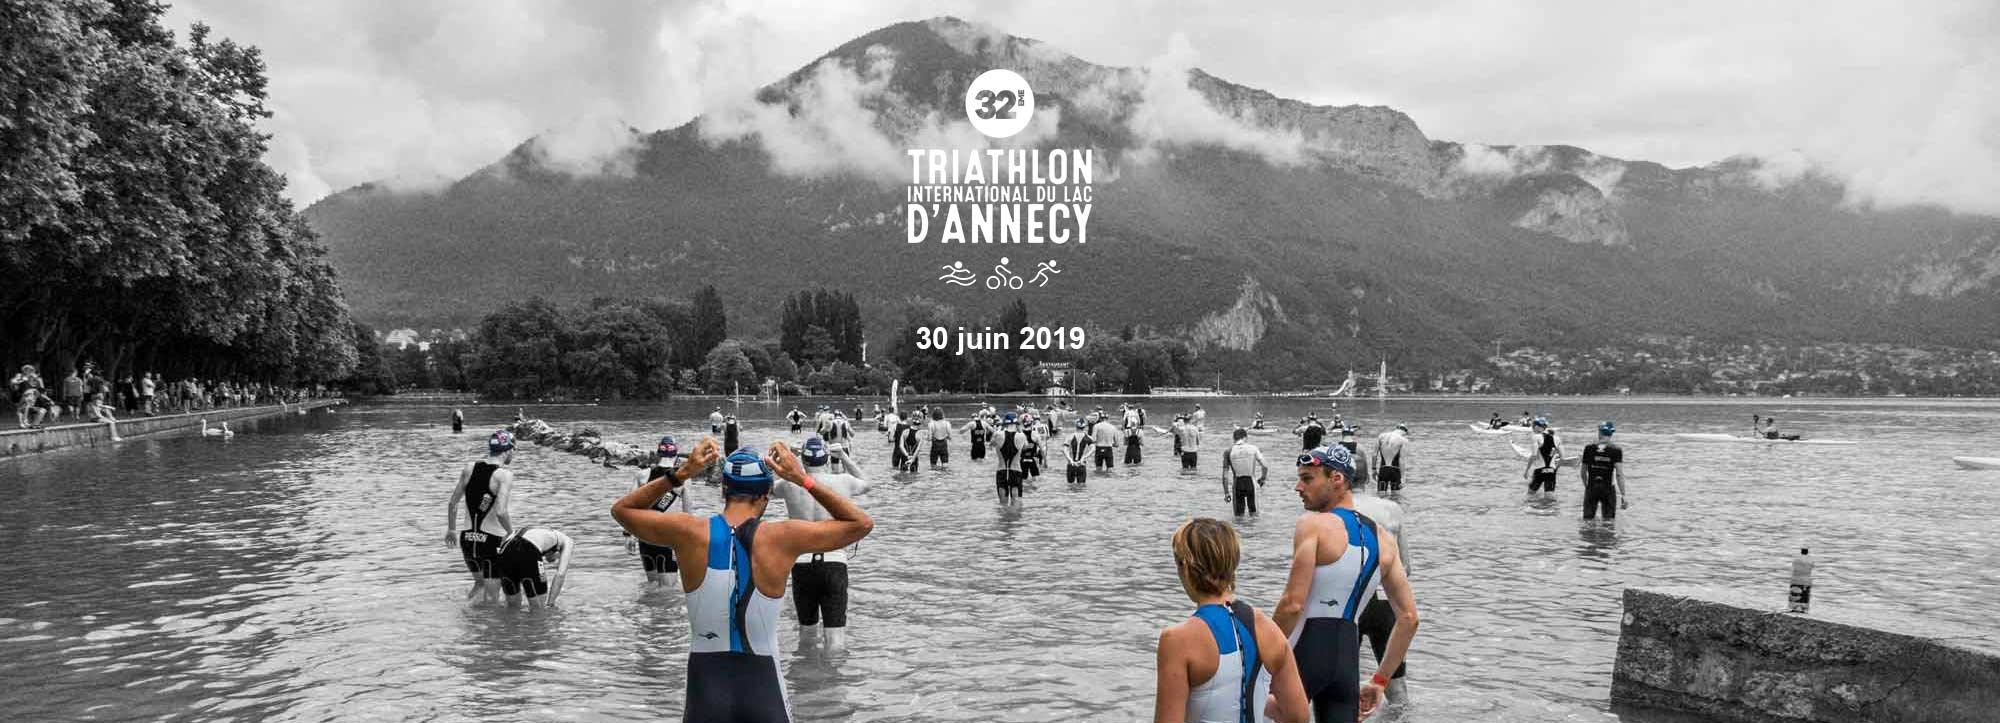 Triathlon Calendrier 2020.Triathlon International Du Lac D Annecy Page D Accueil